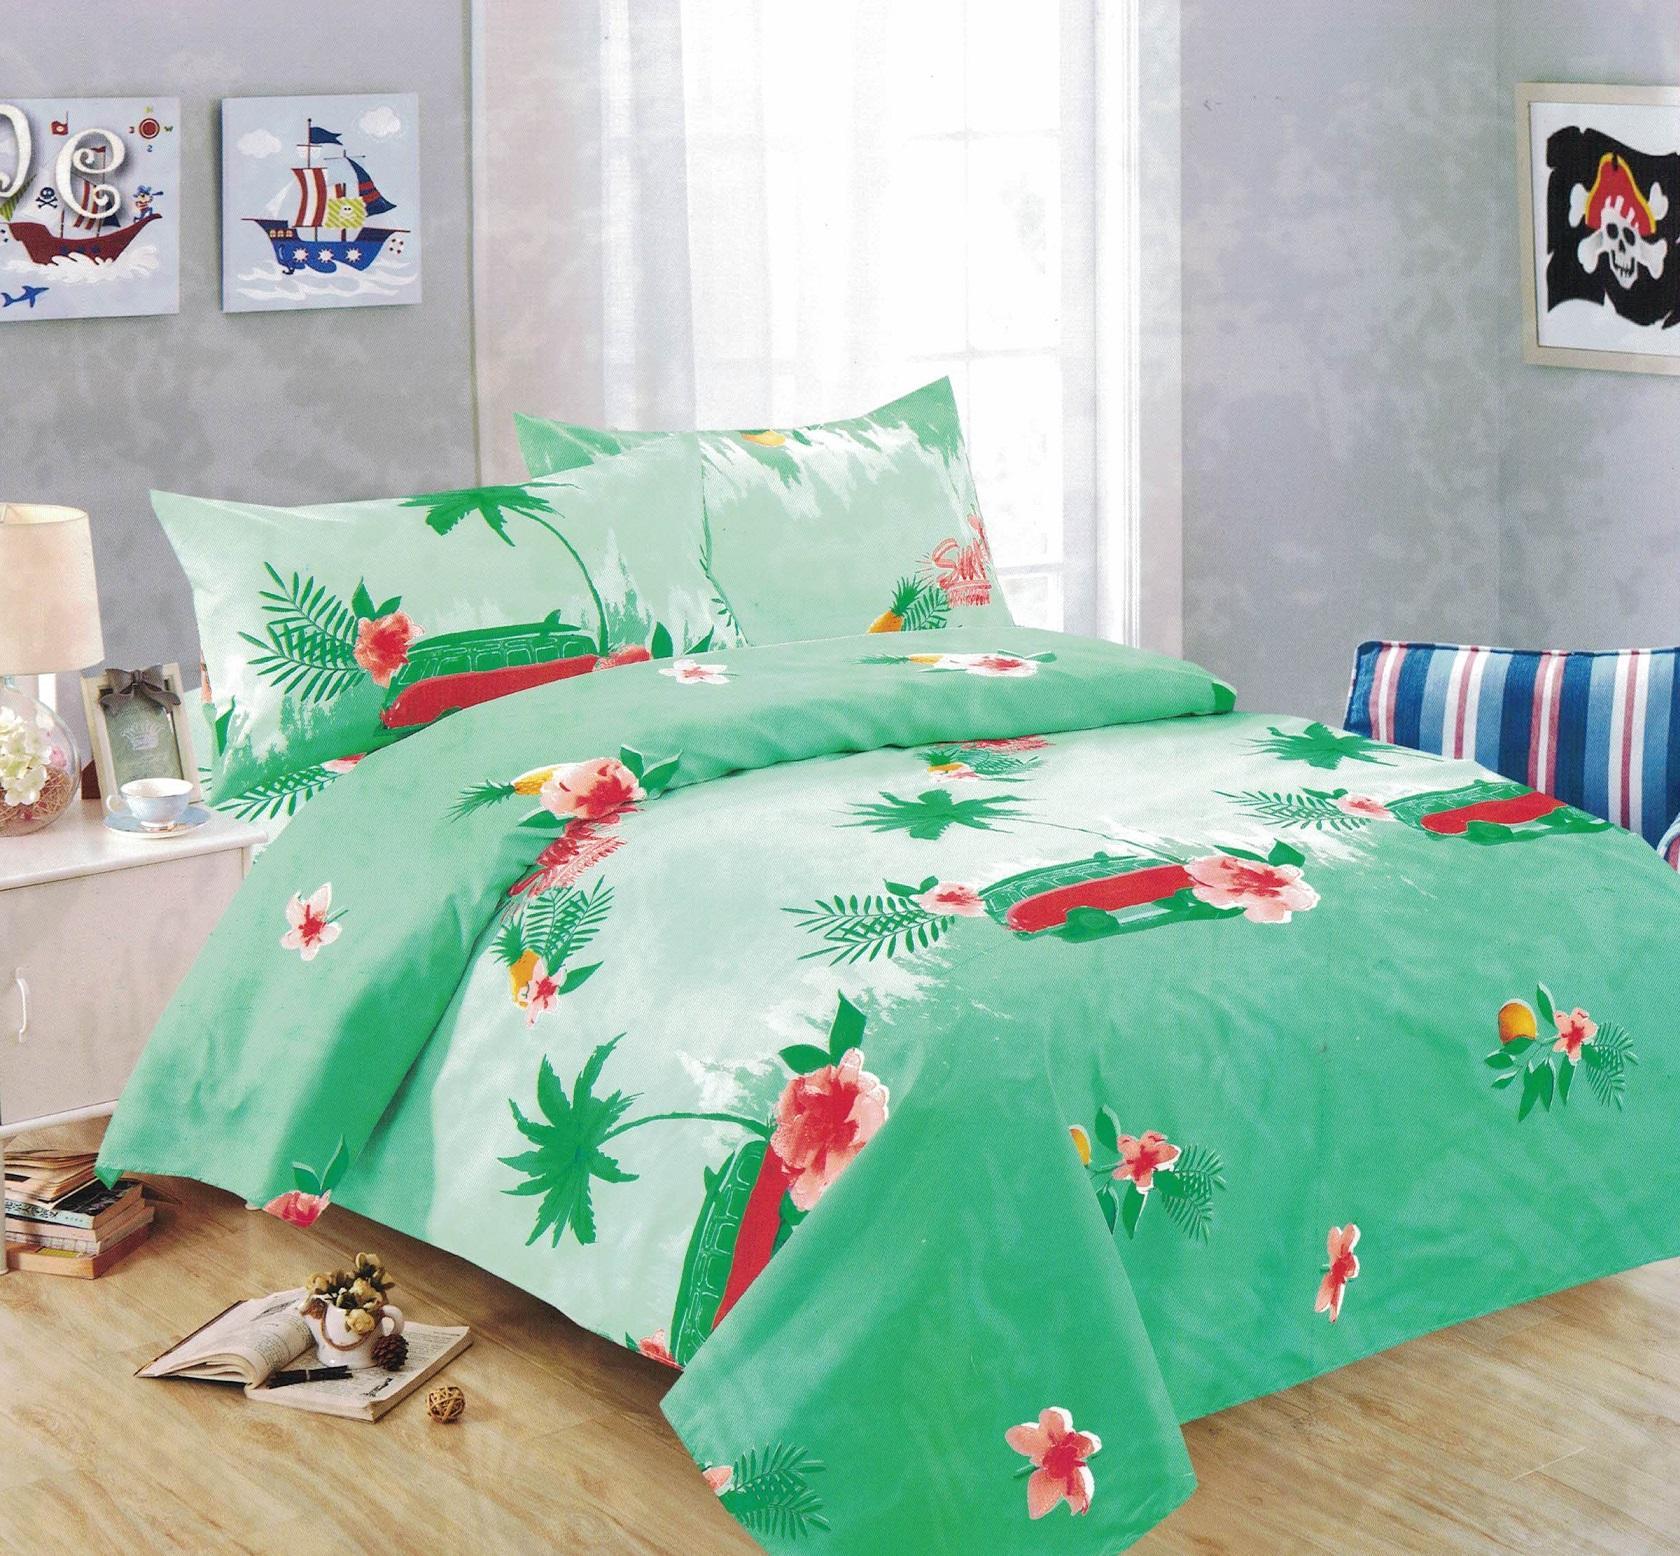 Marvelous Bedtime Bedsheet Single Size 3 Piece Set